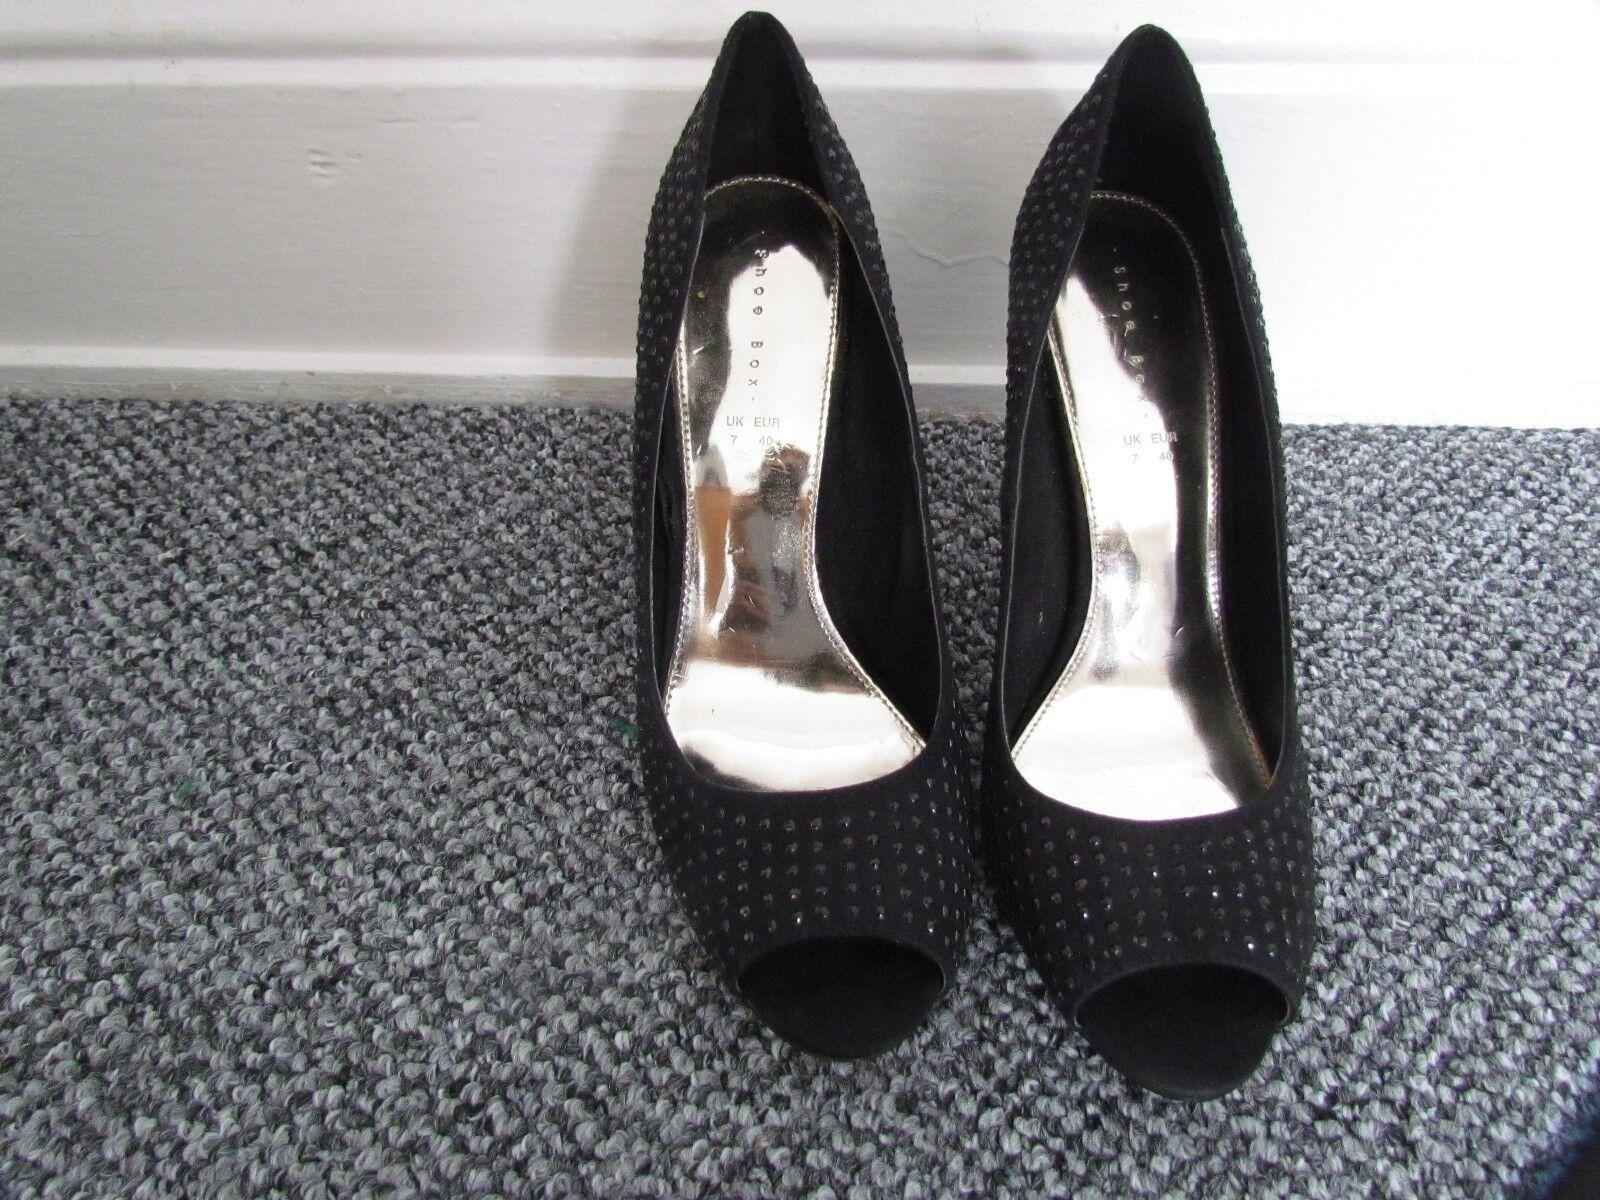 Moda jest prosta i niedroga Black High Heeled Court Shoes Size  7/40 by Shoebox